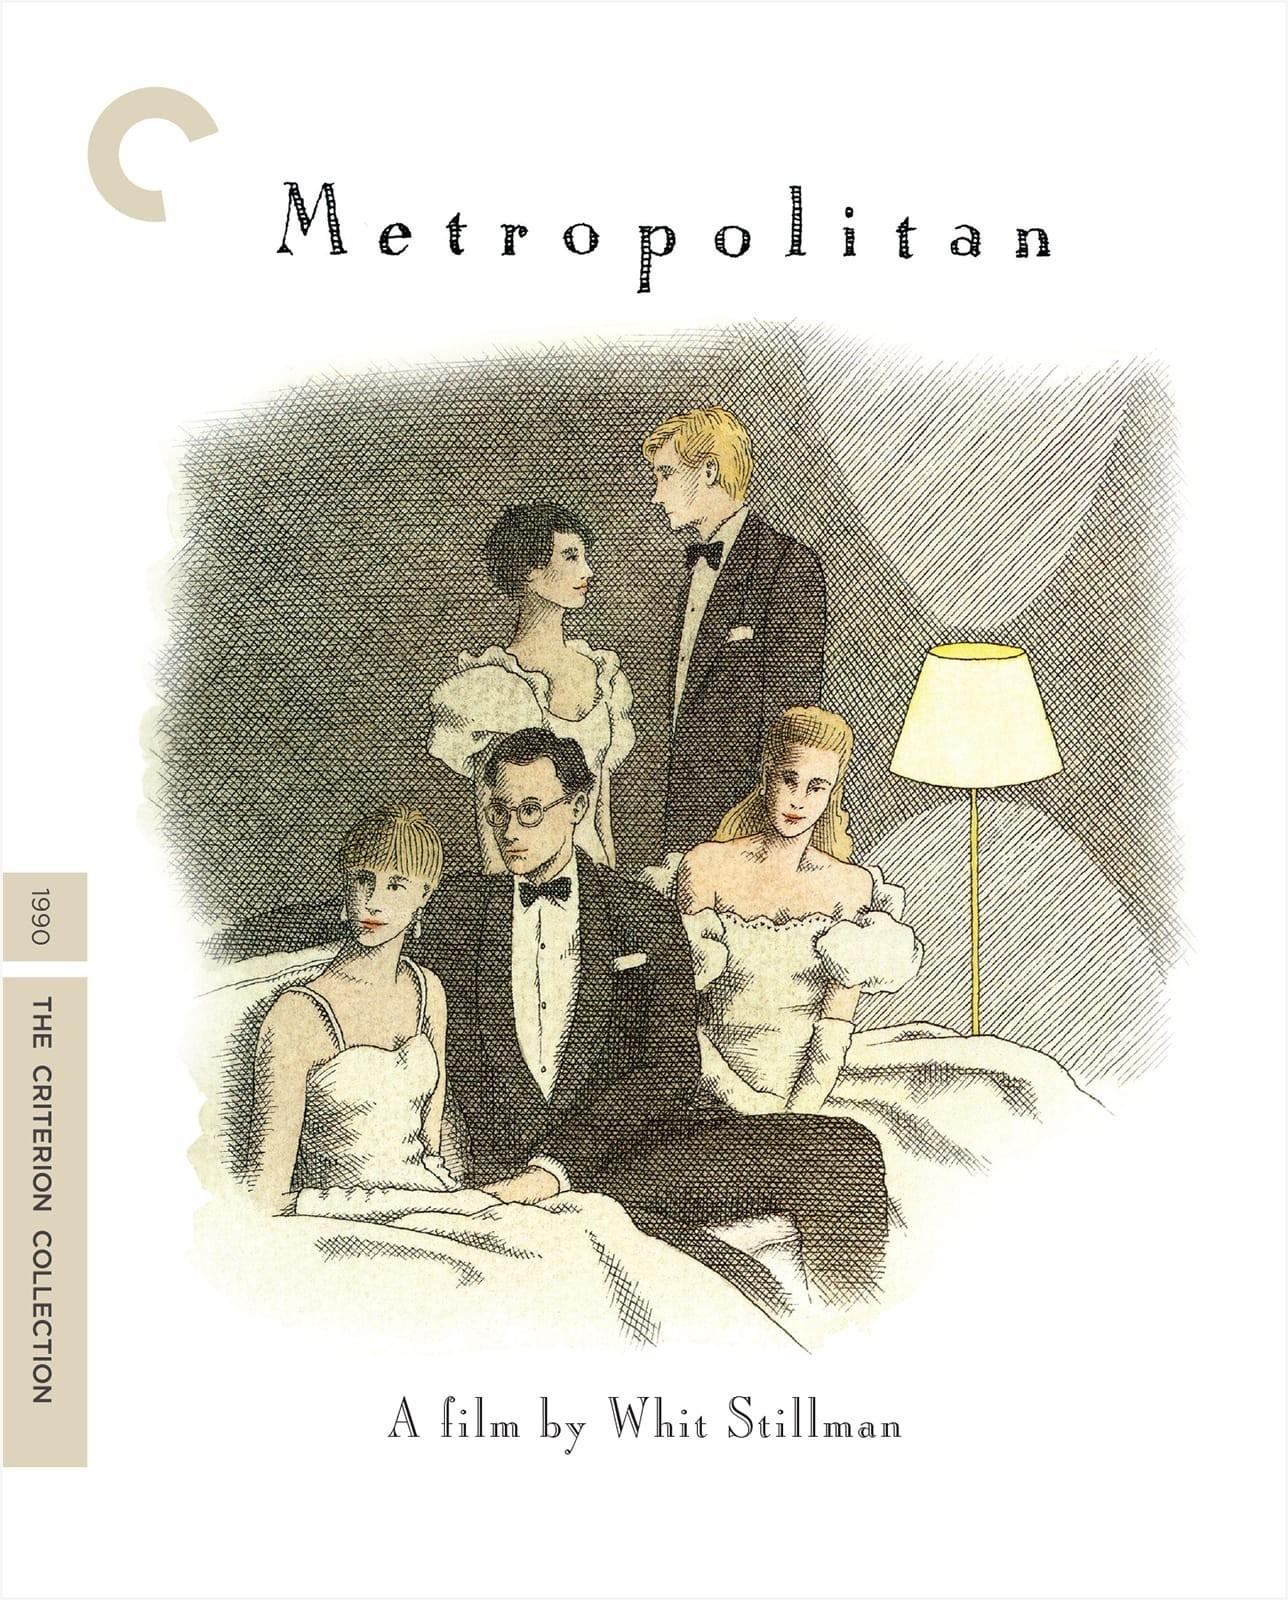 Metropolitan (1990) The Criterion Collection Blu-ray